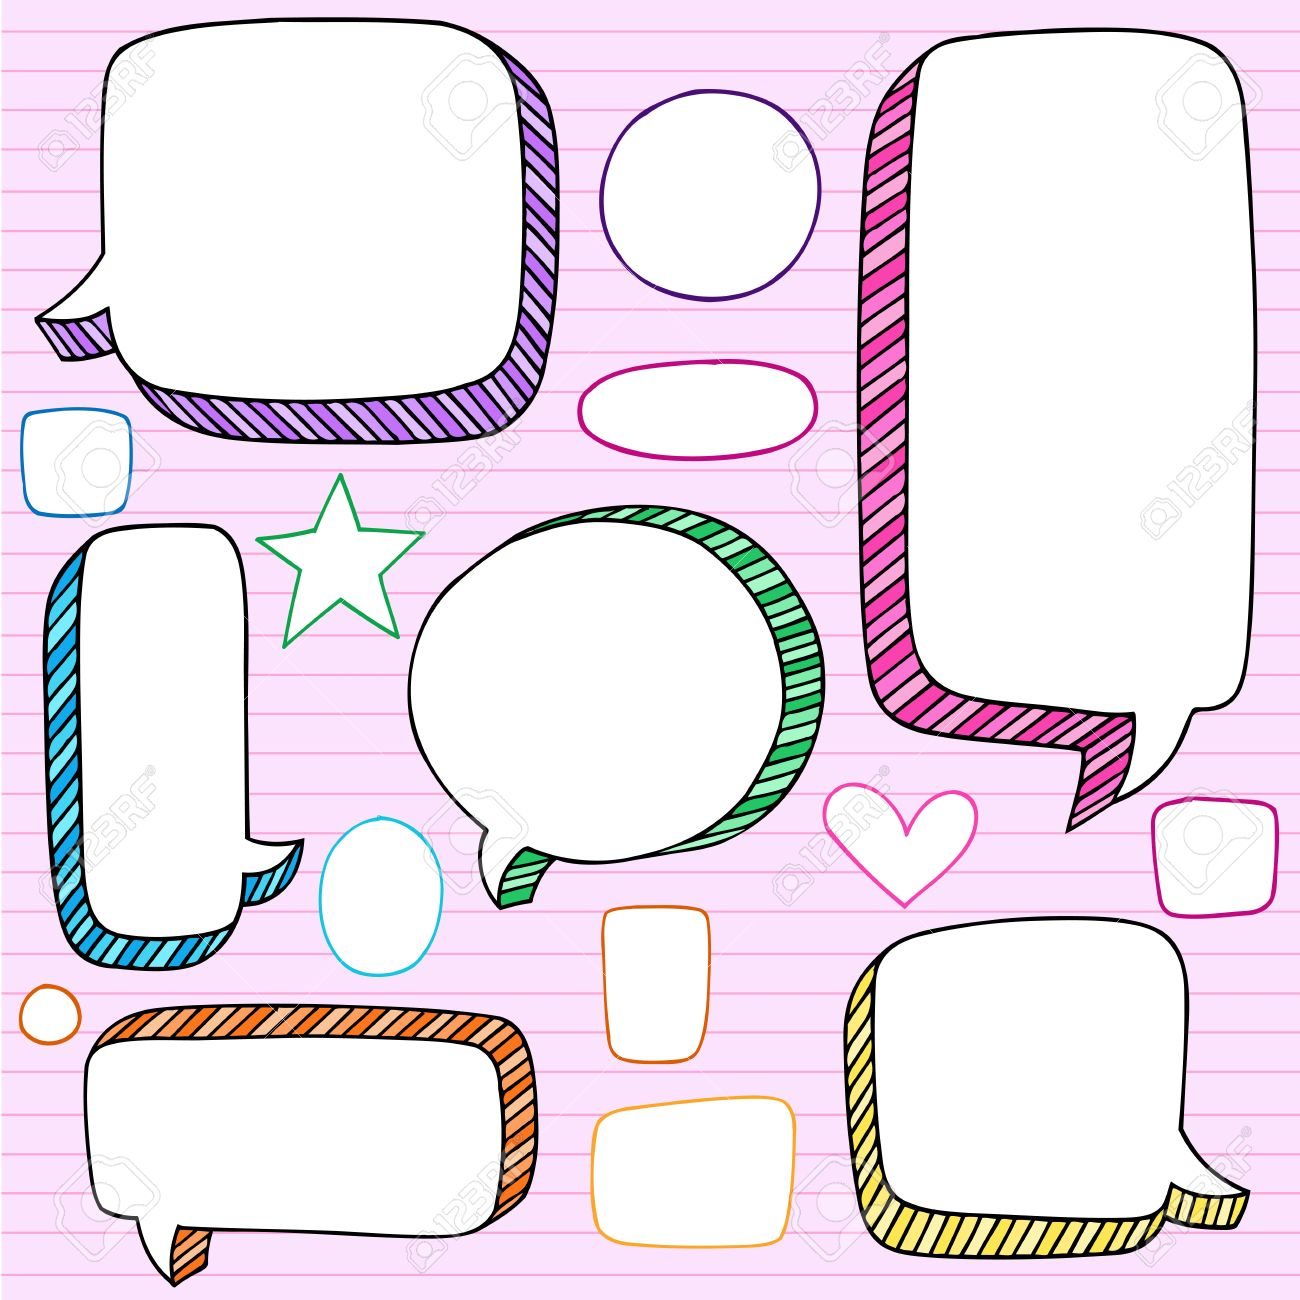 speech bubble frames notebook doodles back to school hand drawn